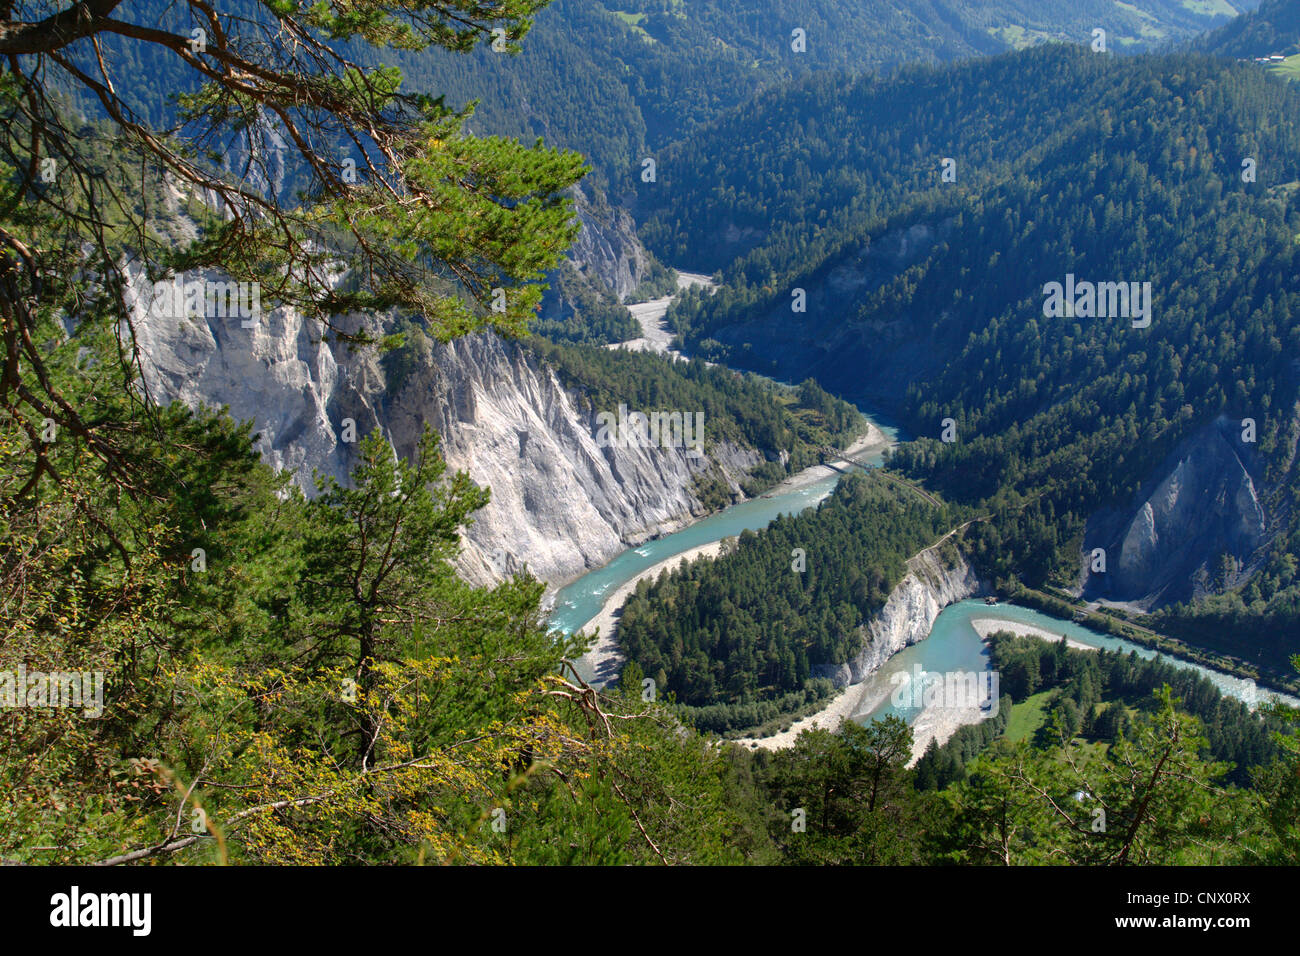 Rhine canyon at Films, Flimser Bergsturz, Switzerland Stock Photo